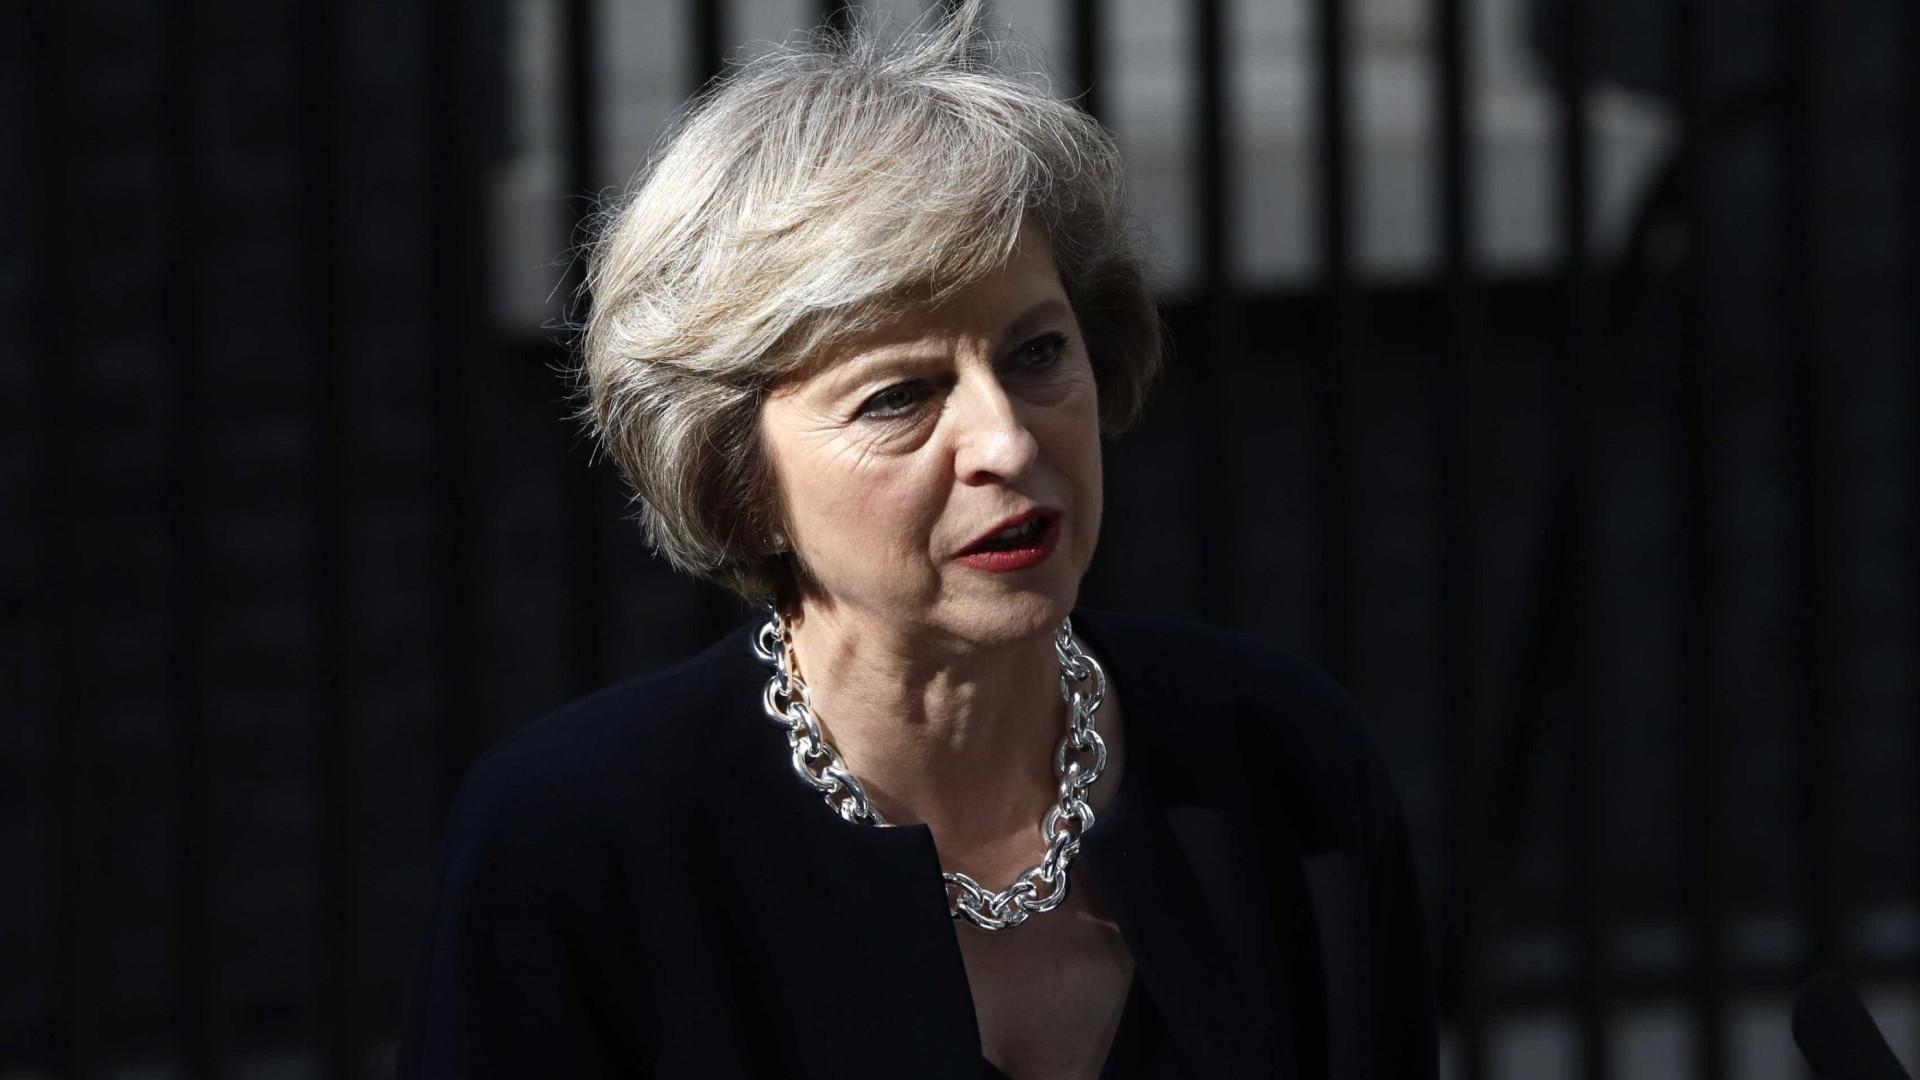 Theresa May pondera antecipar eleições para novembro